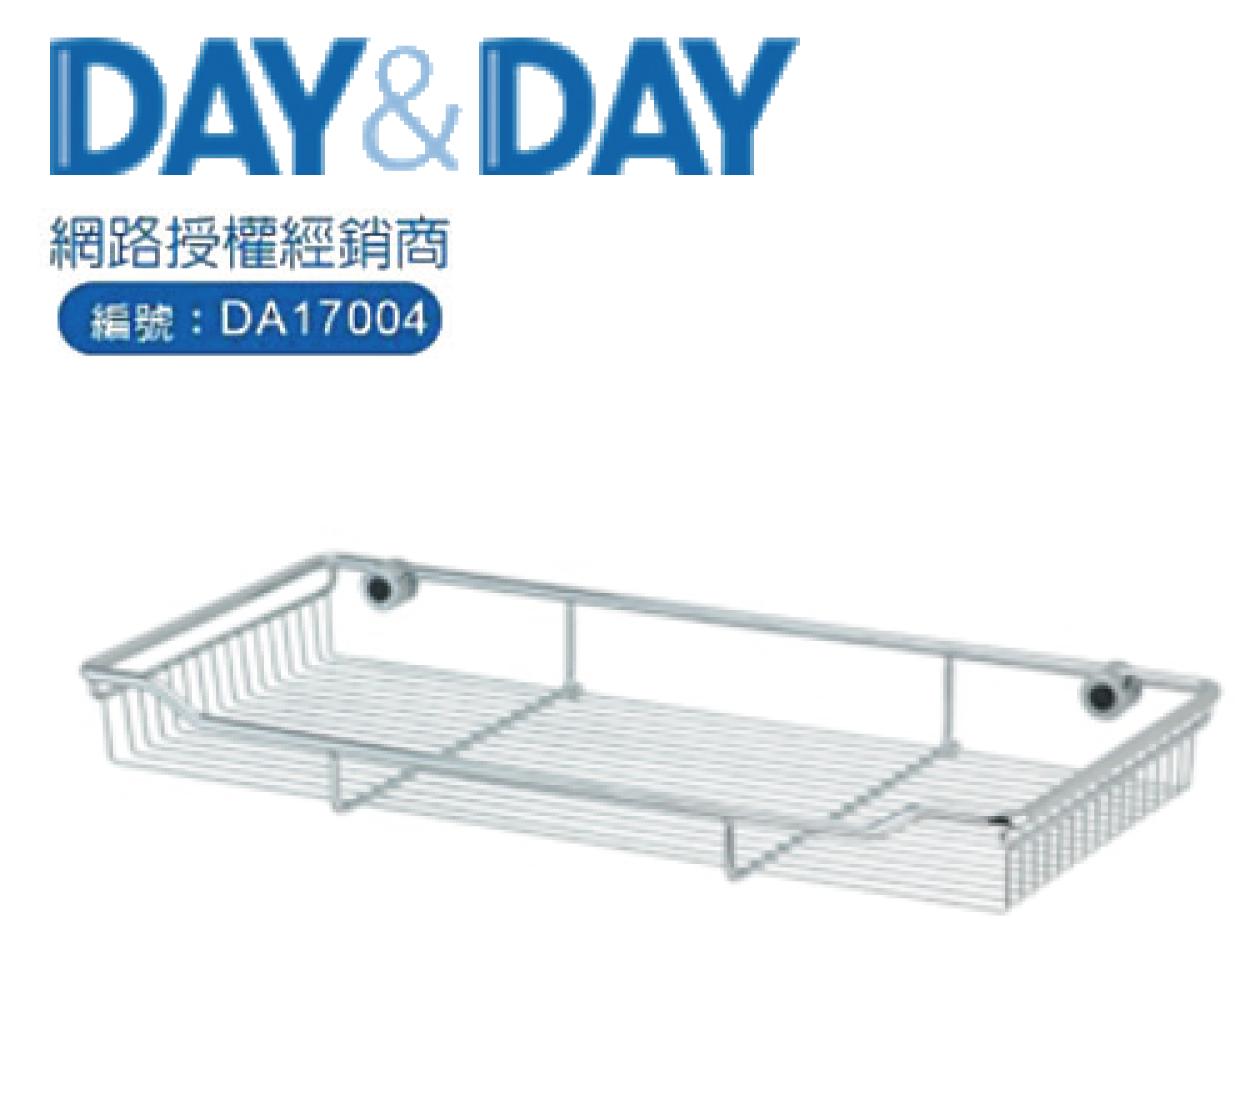 DAY&DAY 多功能架(ST2298LH)